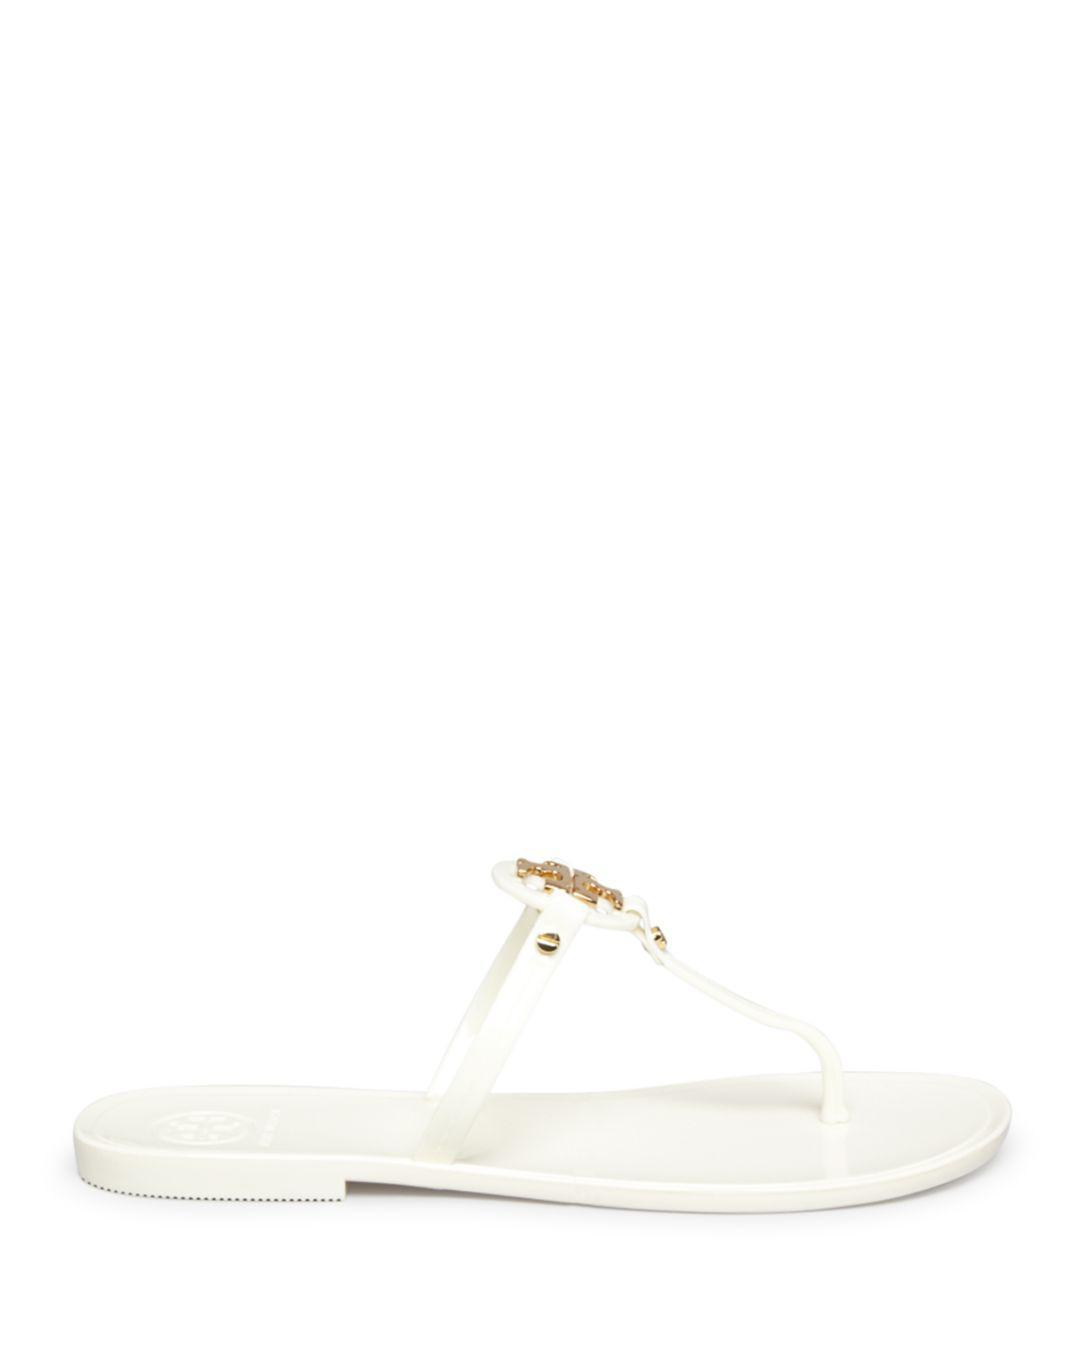 cf969246655 Tory Burch Mini Miller Jelly Flat Thong Sandals in Metallic - Lyst